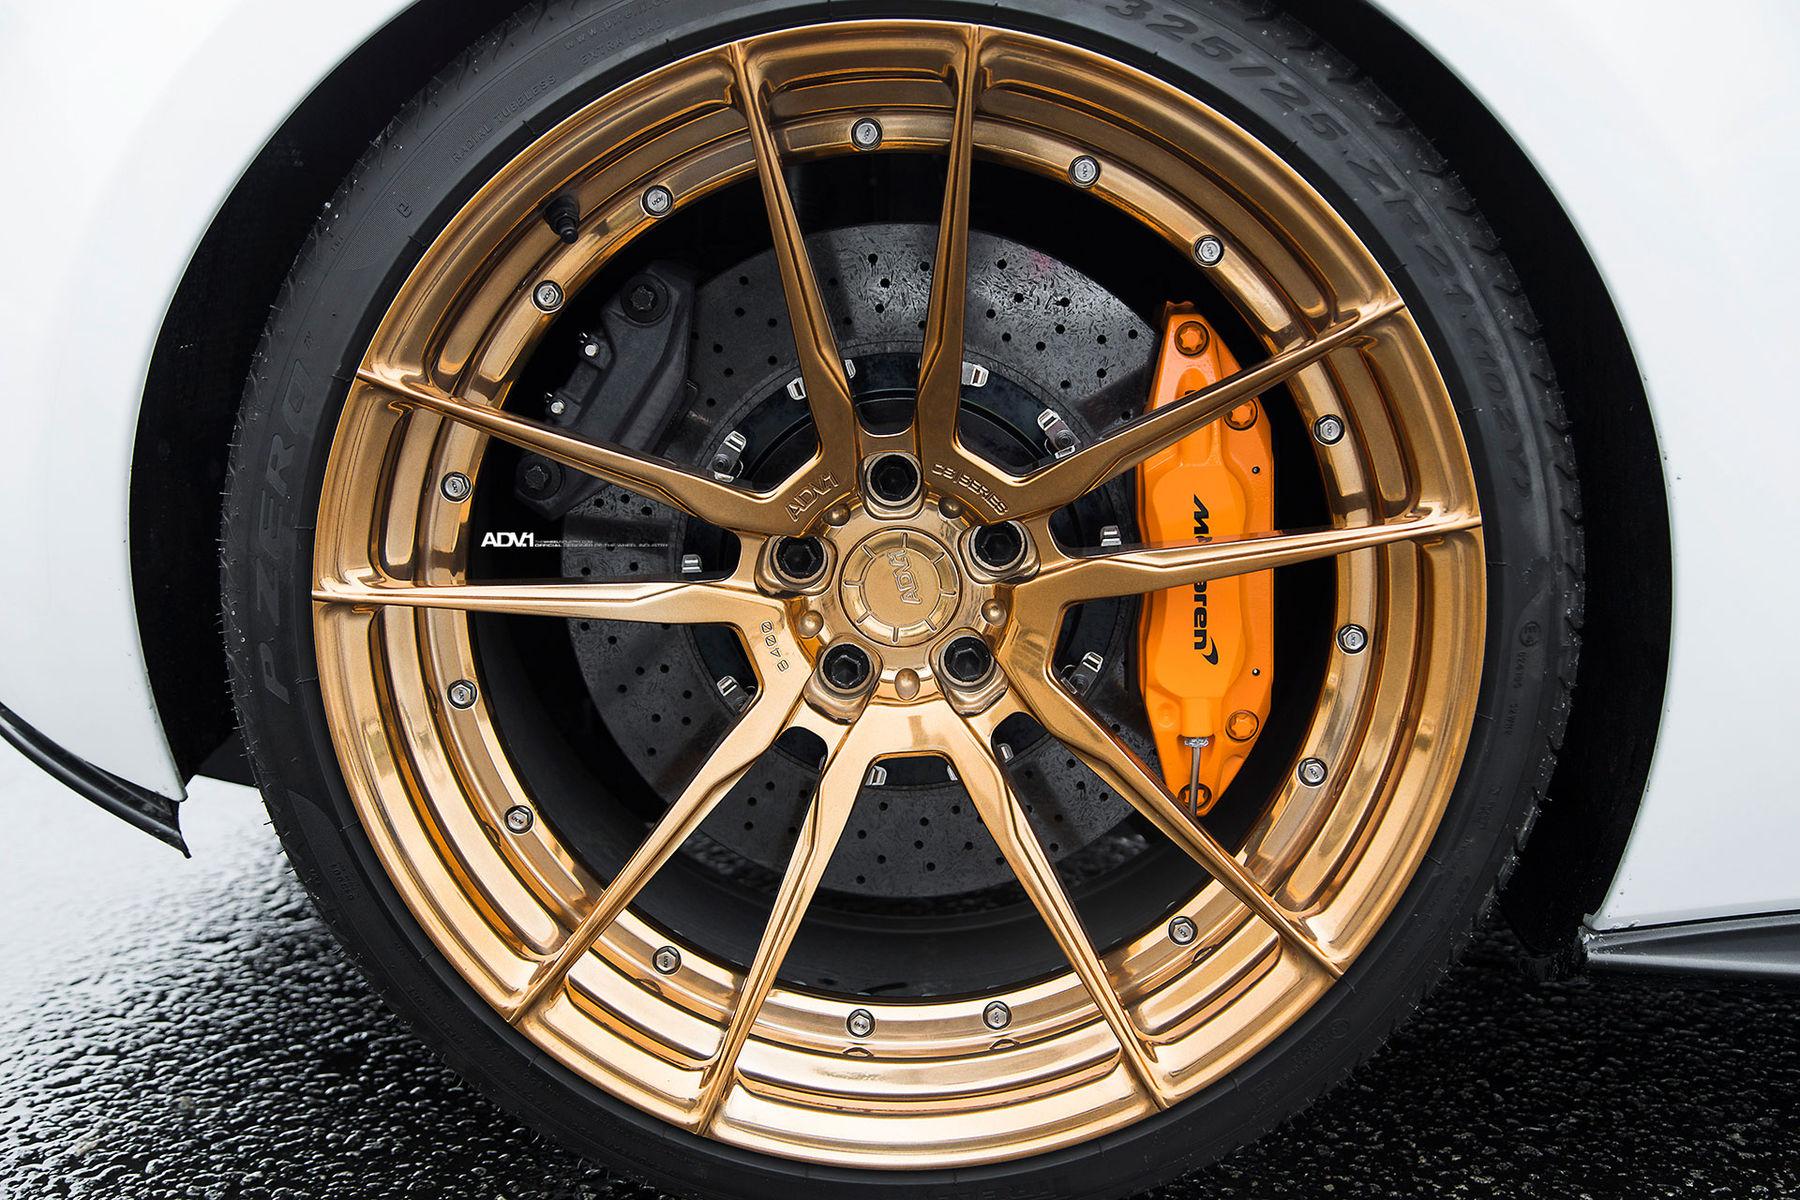 McLaren 570S | Silica White McLaren 570S Coupe - ADV5.2 M.V2 CS Series Wheels